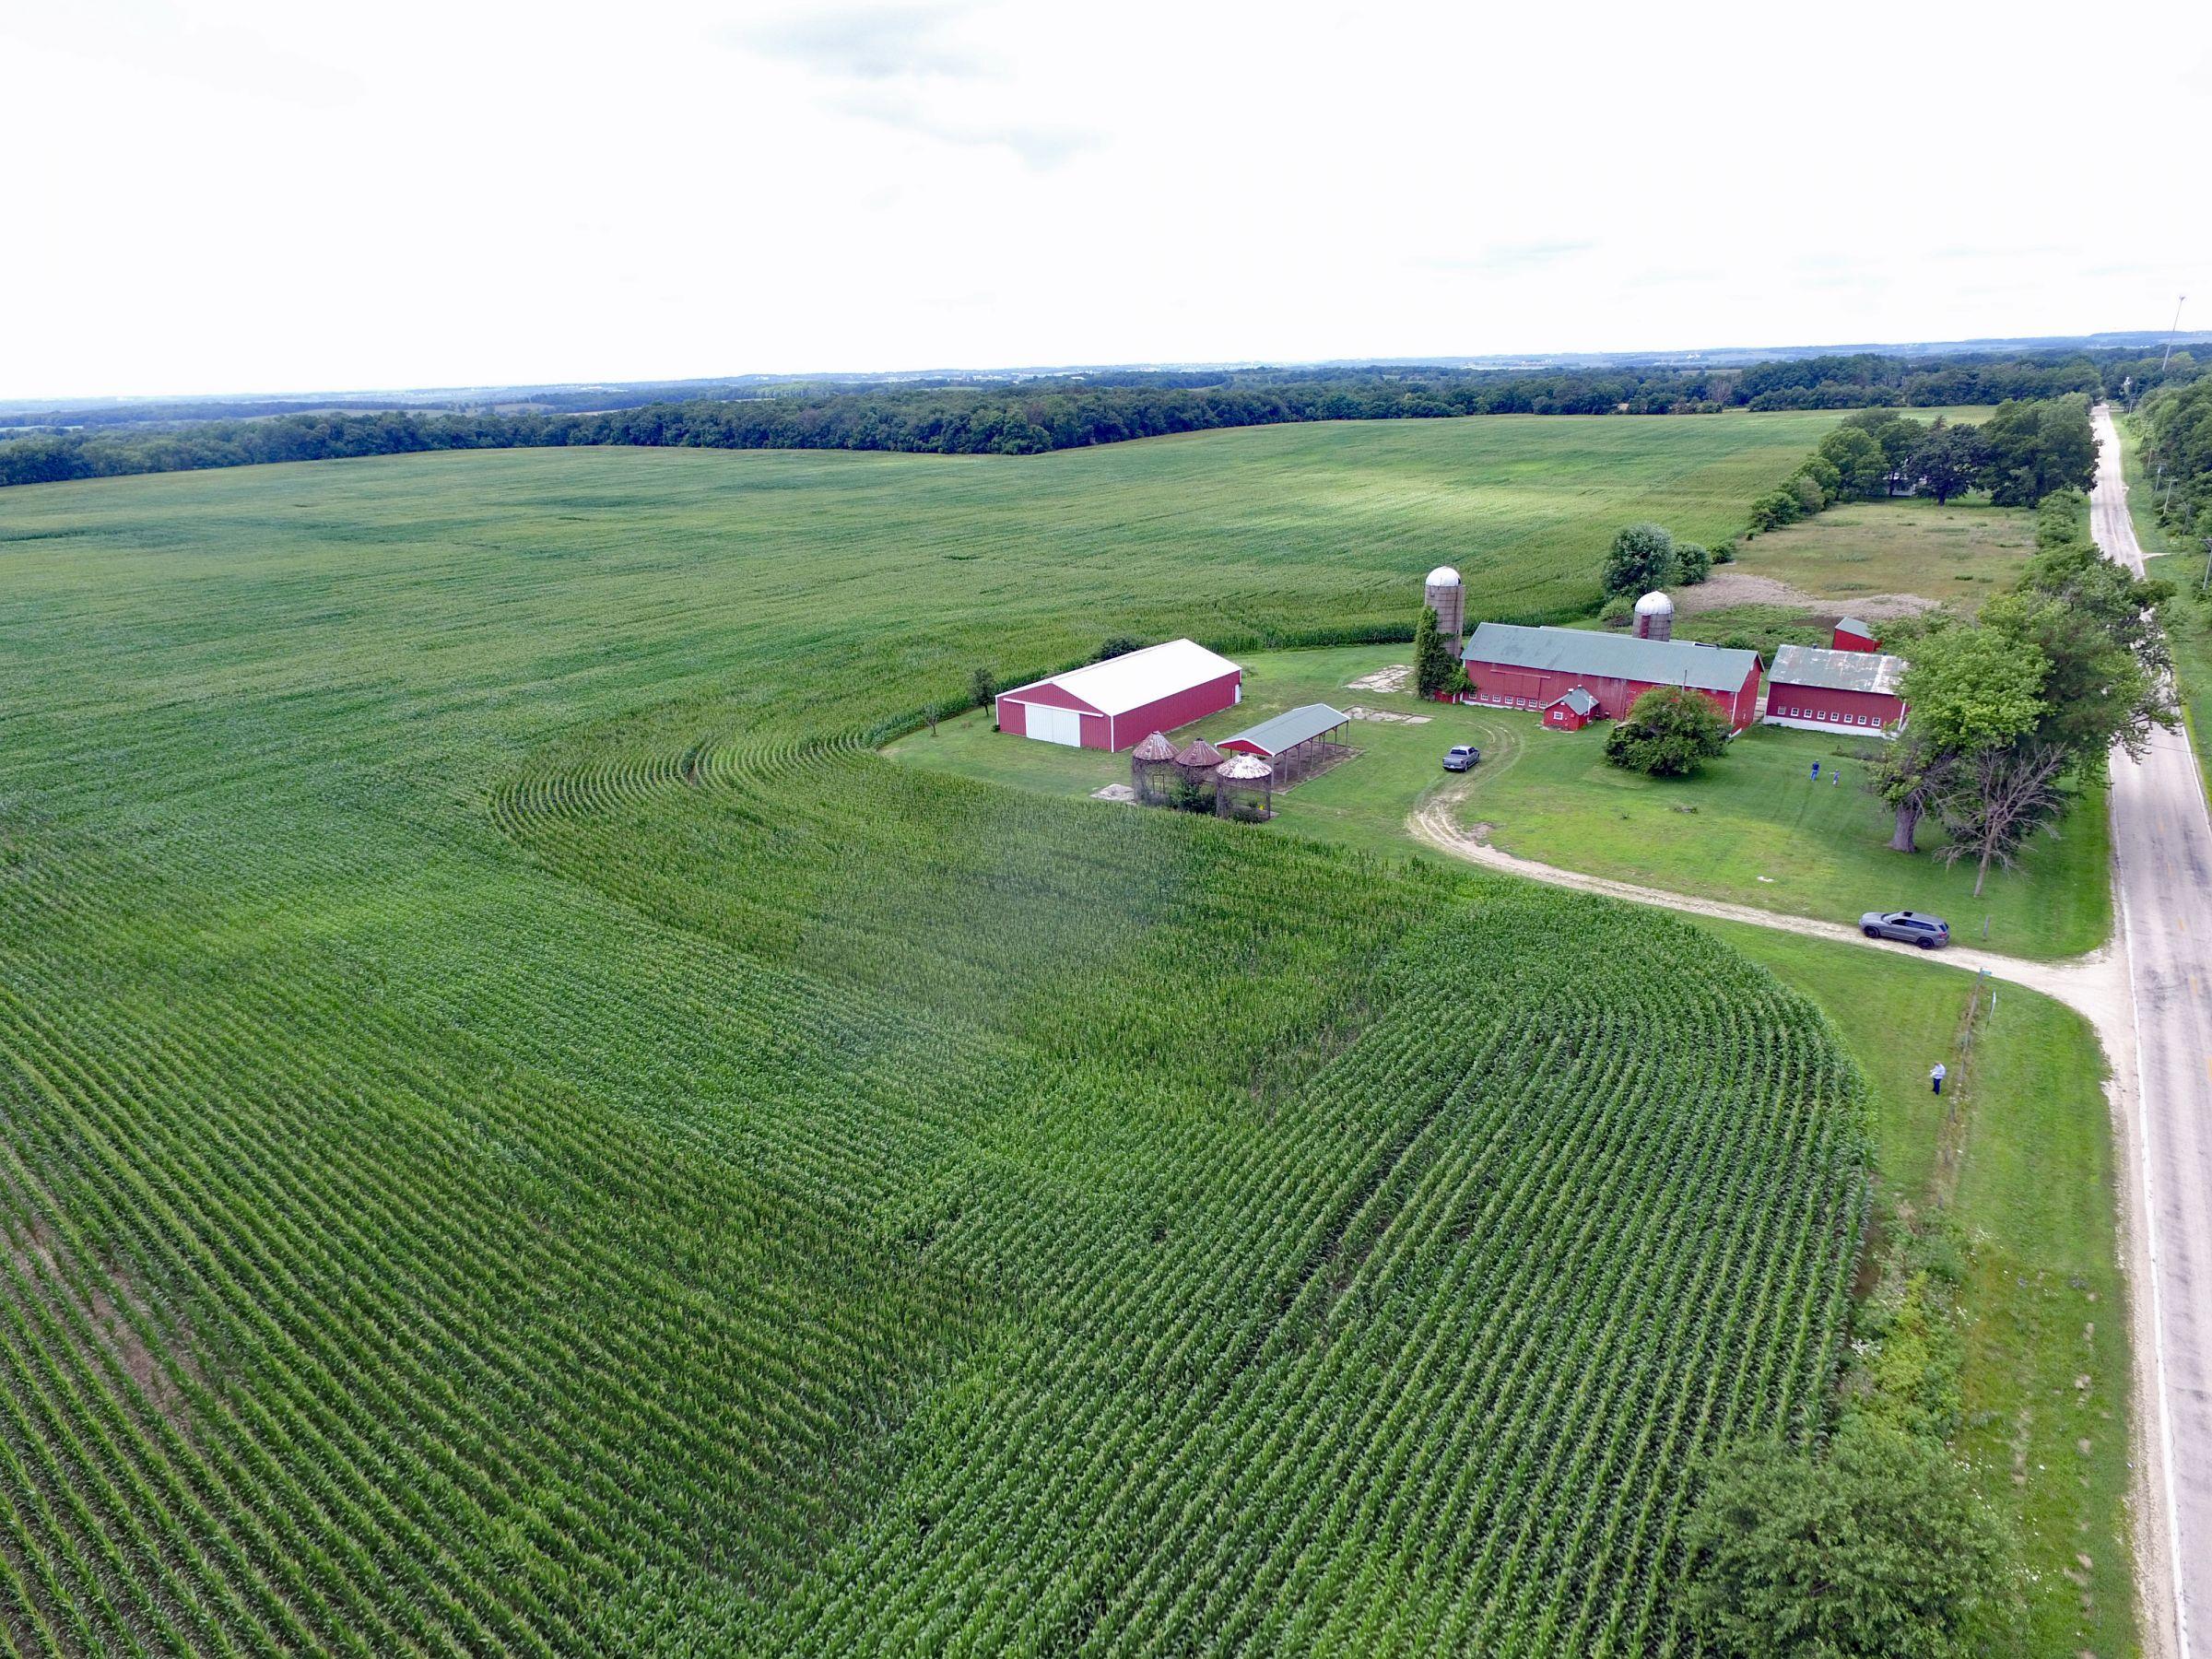 land-winnebago-county-illinois-127-acres-listing-number-15094-2-2020-08-03-160423.jpg